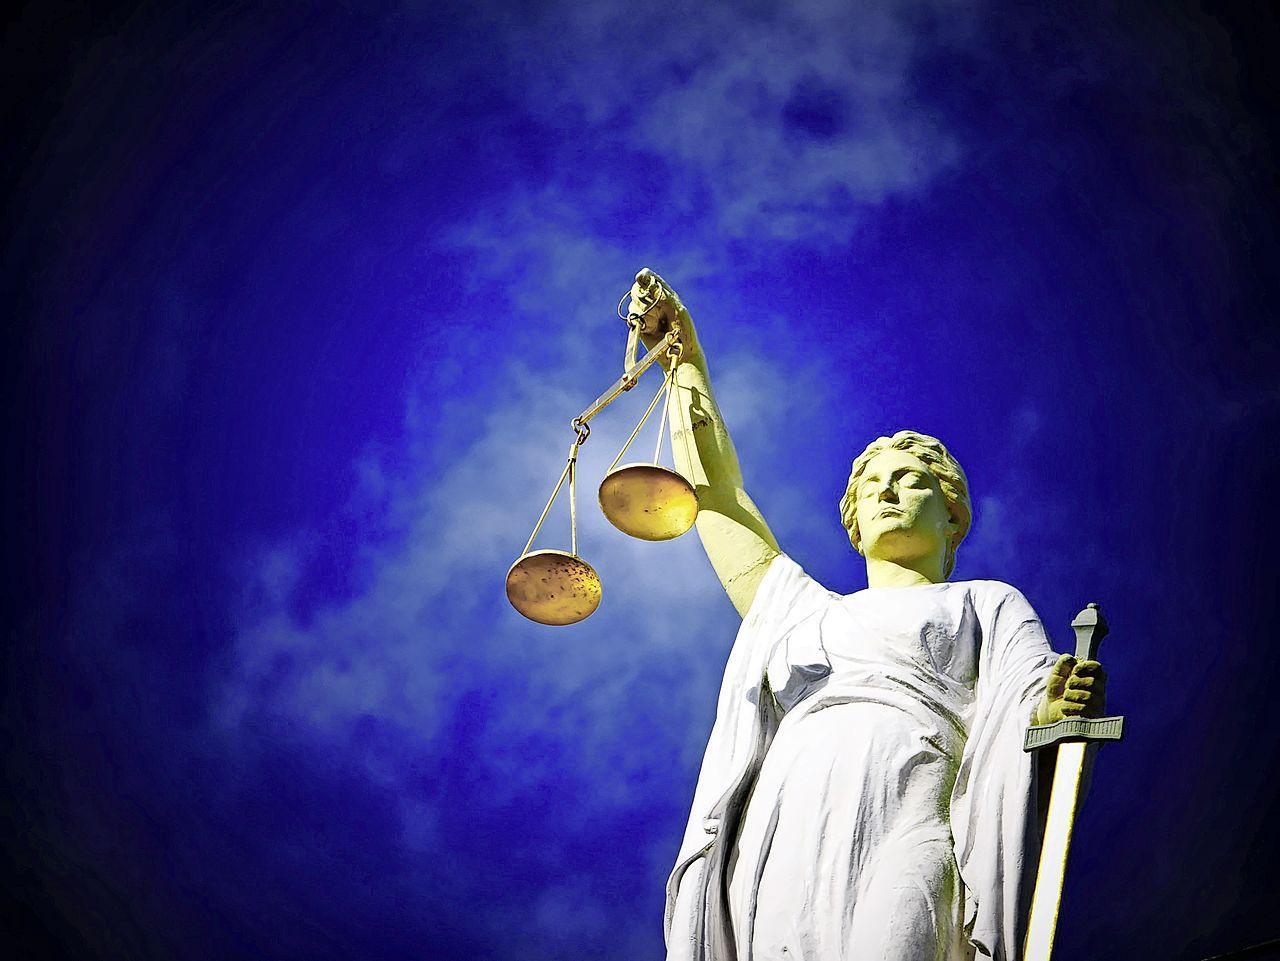 Rechtbank Alkmaar spreekt Amsterdamse drillrapper vrij na steekpartij in Oostzaan